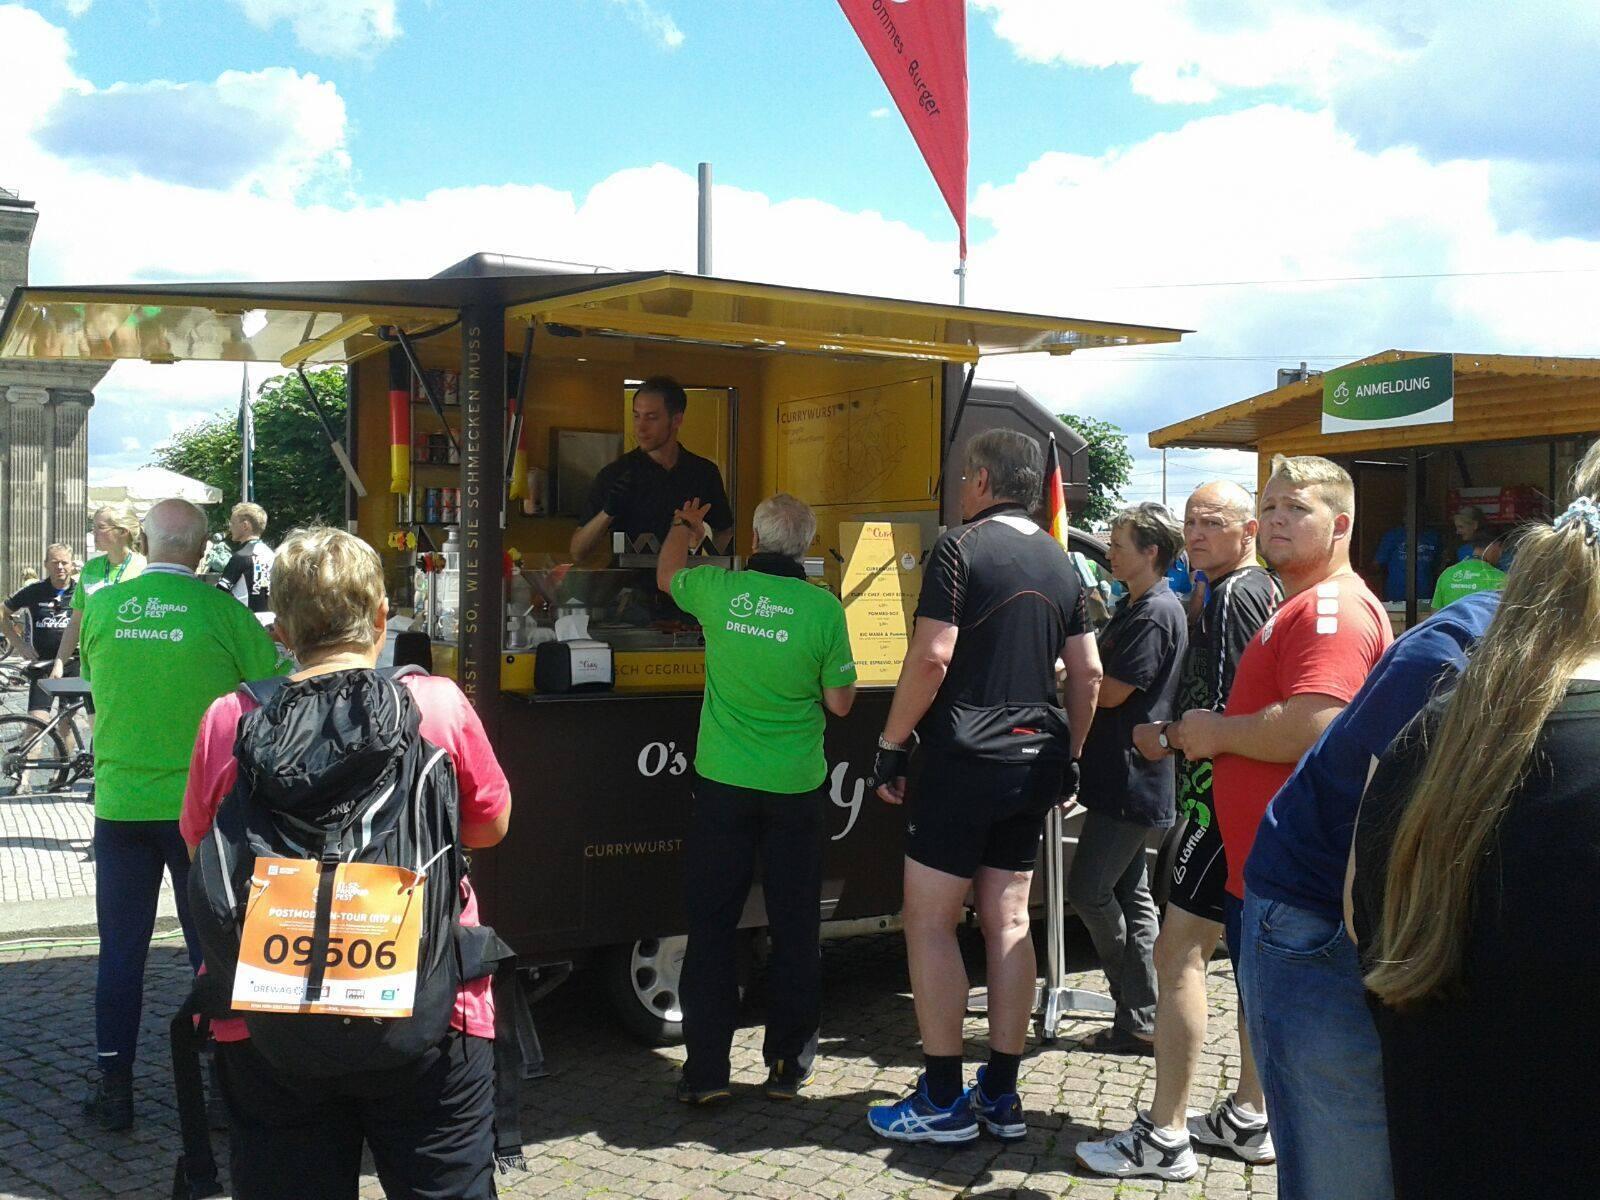 O's Curry Foodtruck Catering München, Köln, Berlin, Hamburg, Osnabrück, Mainz, Dresden, Catering, Event, Streetfood, Tour, Lieferservice, Liefando, Lieferheld